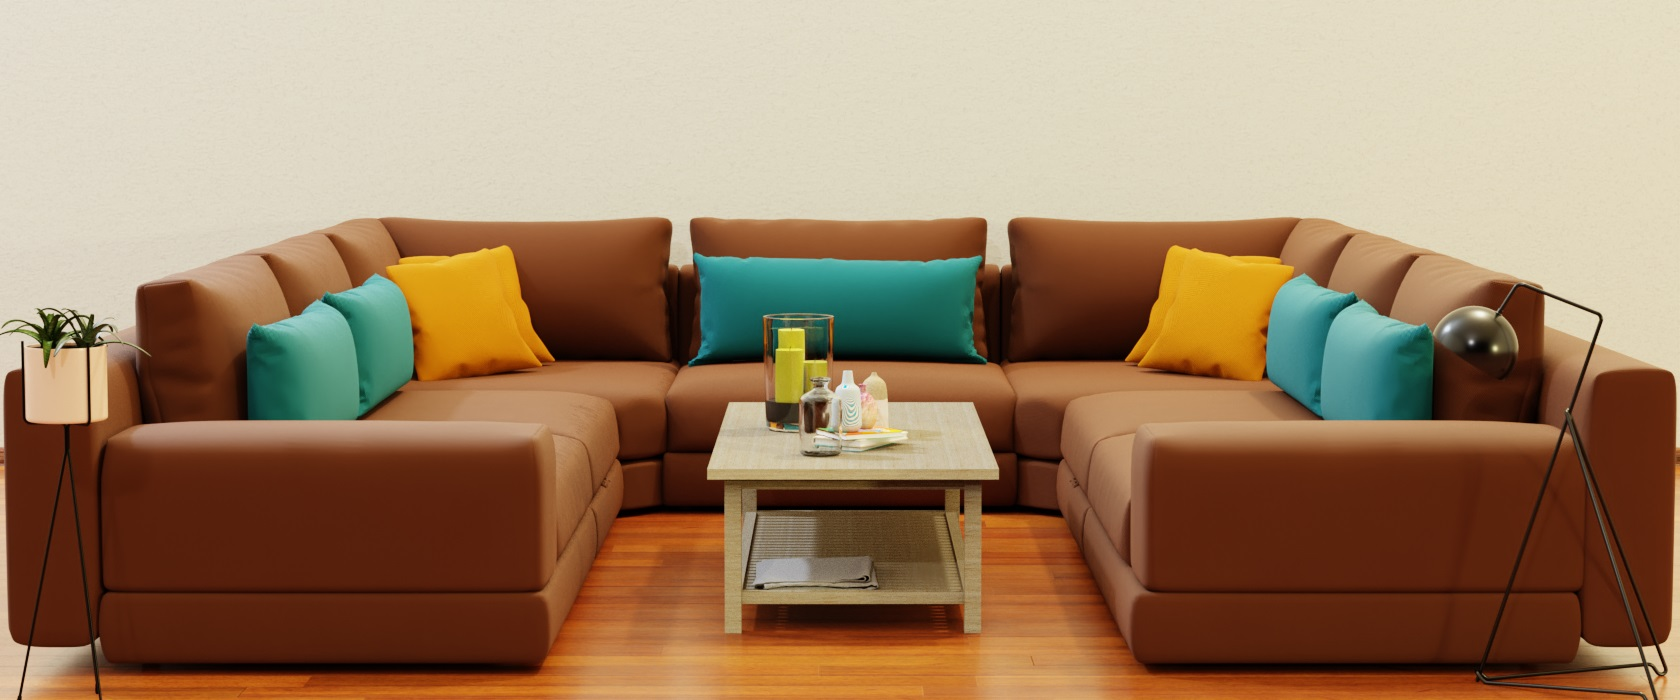 Модульный диван Dario 340x355 - Фото 2 - Pufetto